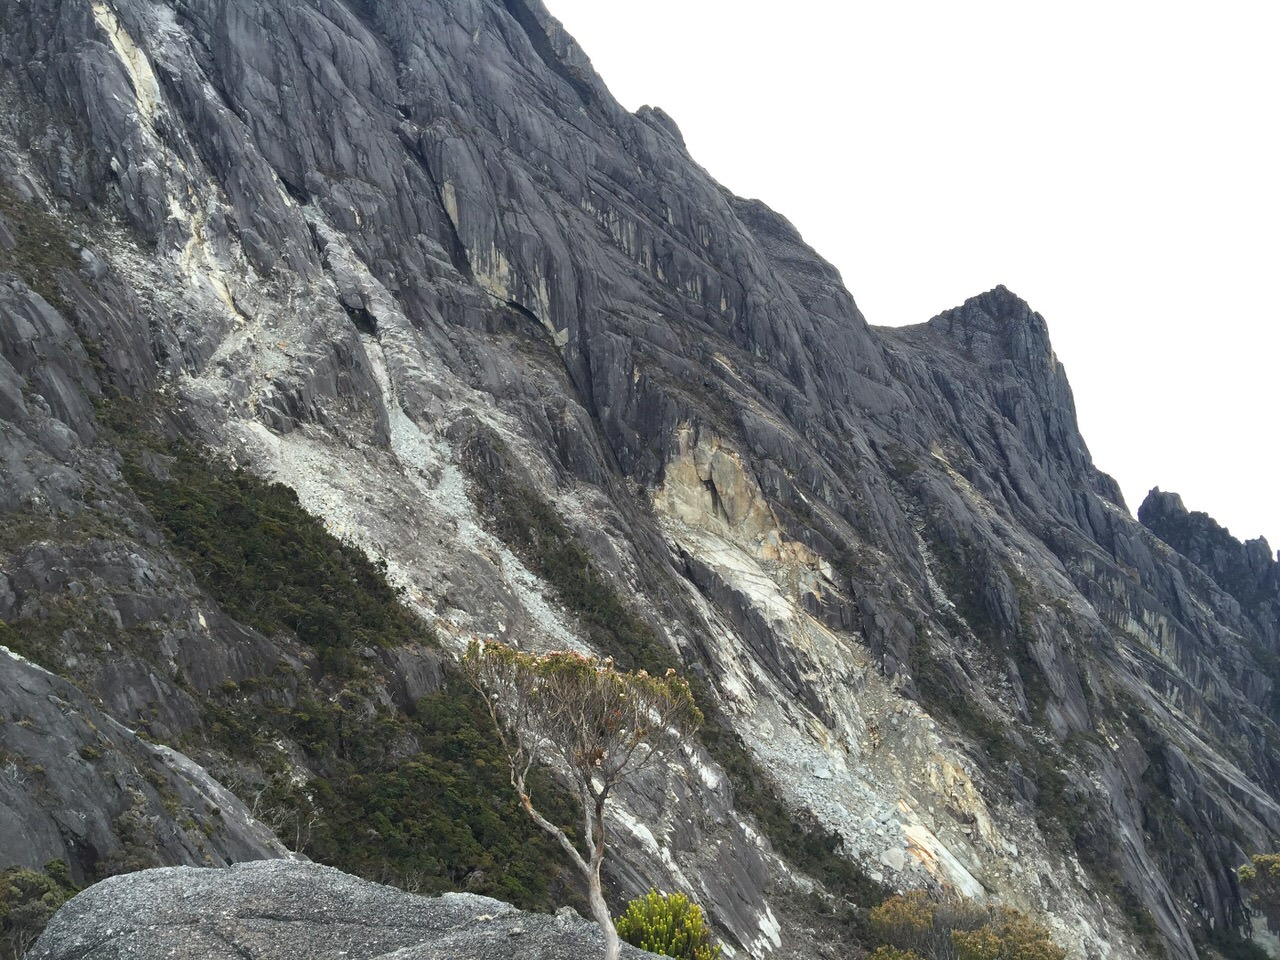 Kota Kinabalu climbing 4190